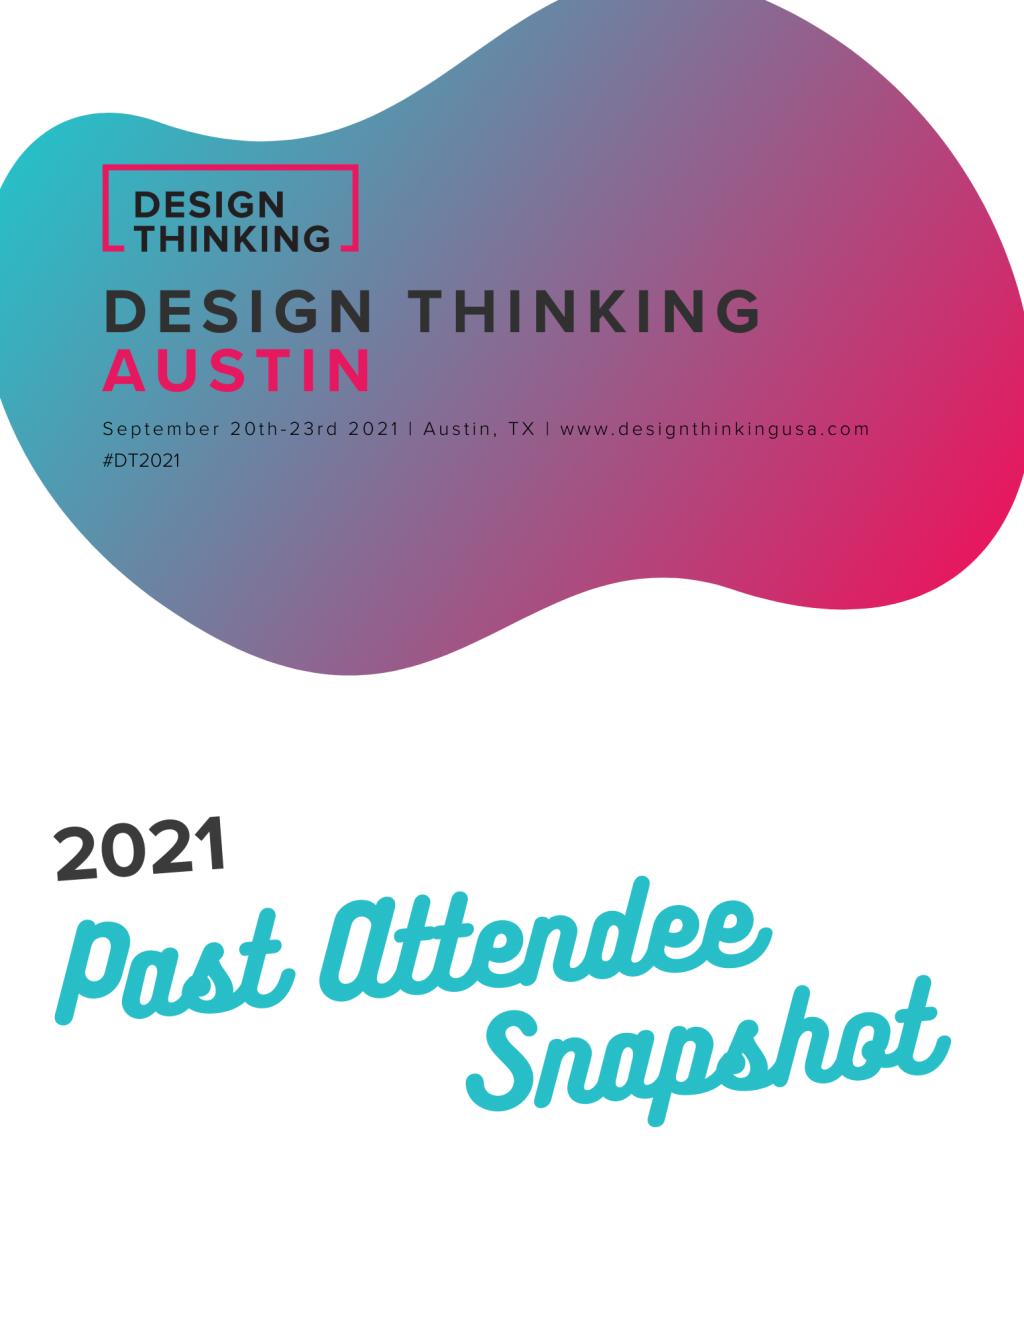 Design Thinking Attendee Snapshot